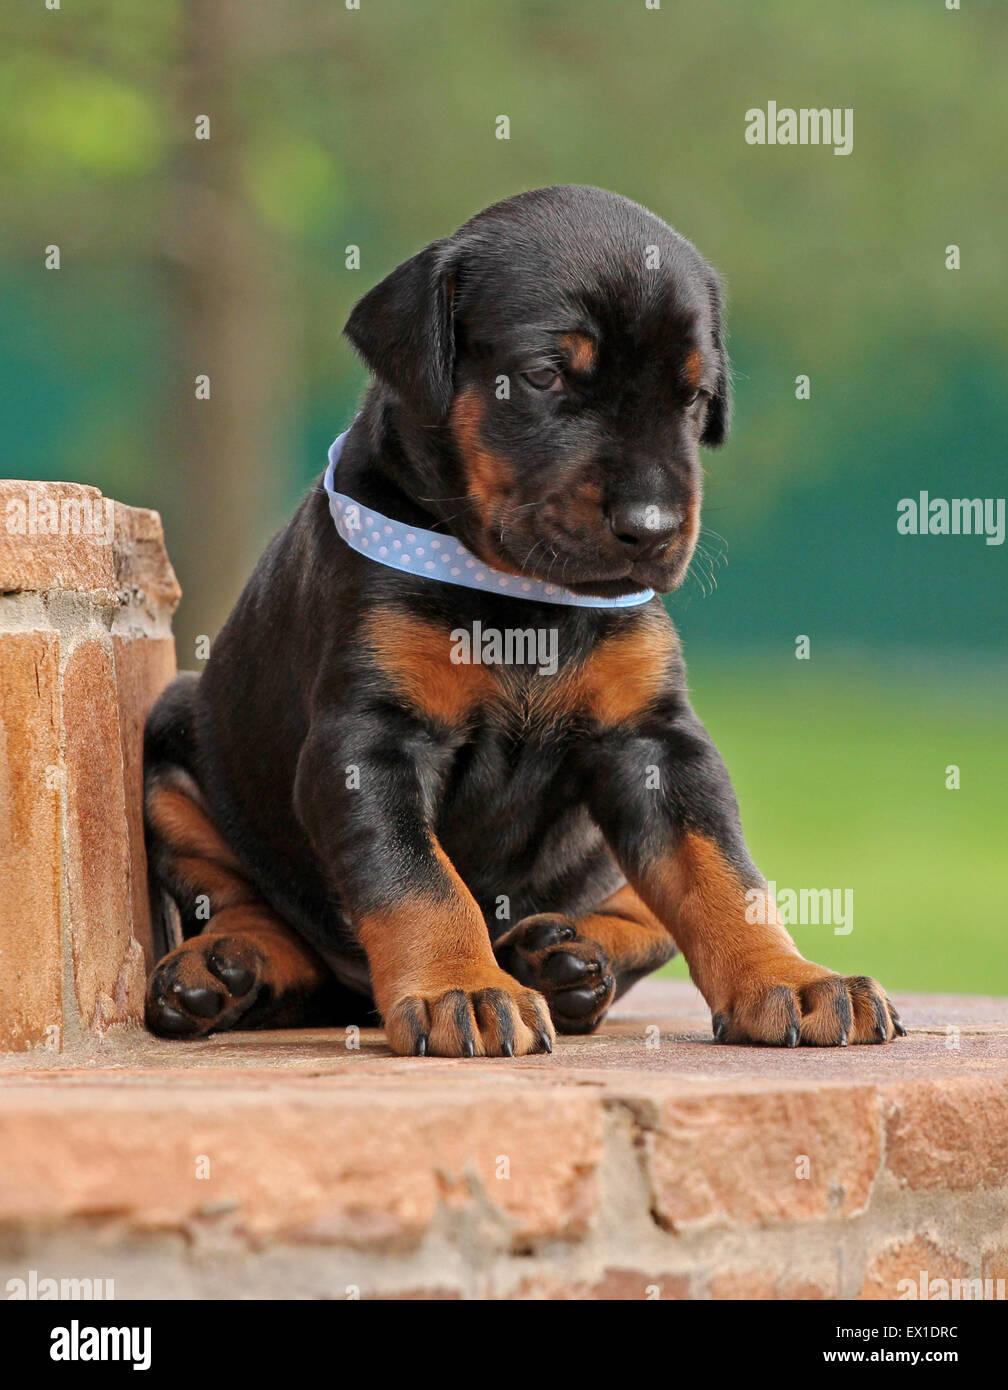 Dobermann puppy on green background - Stock Image